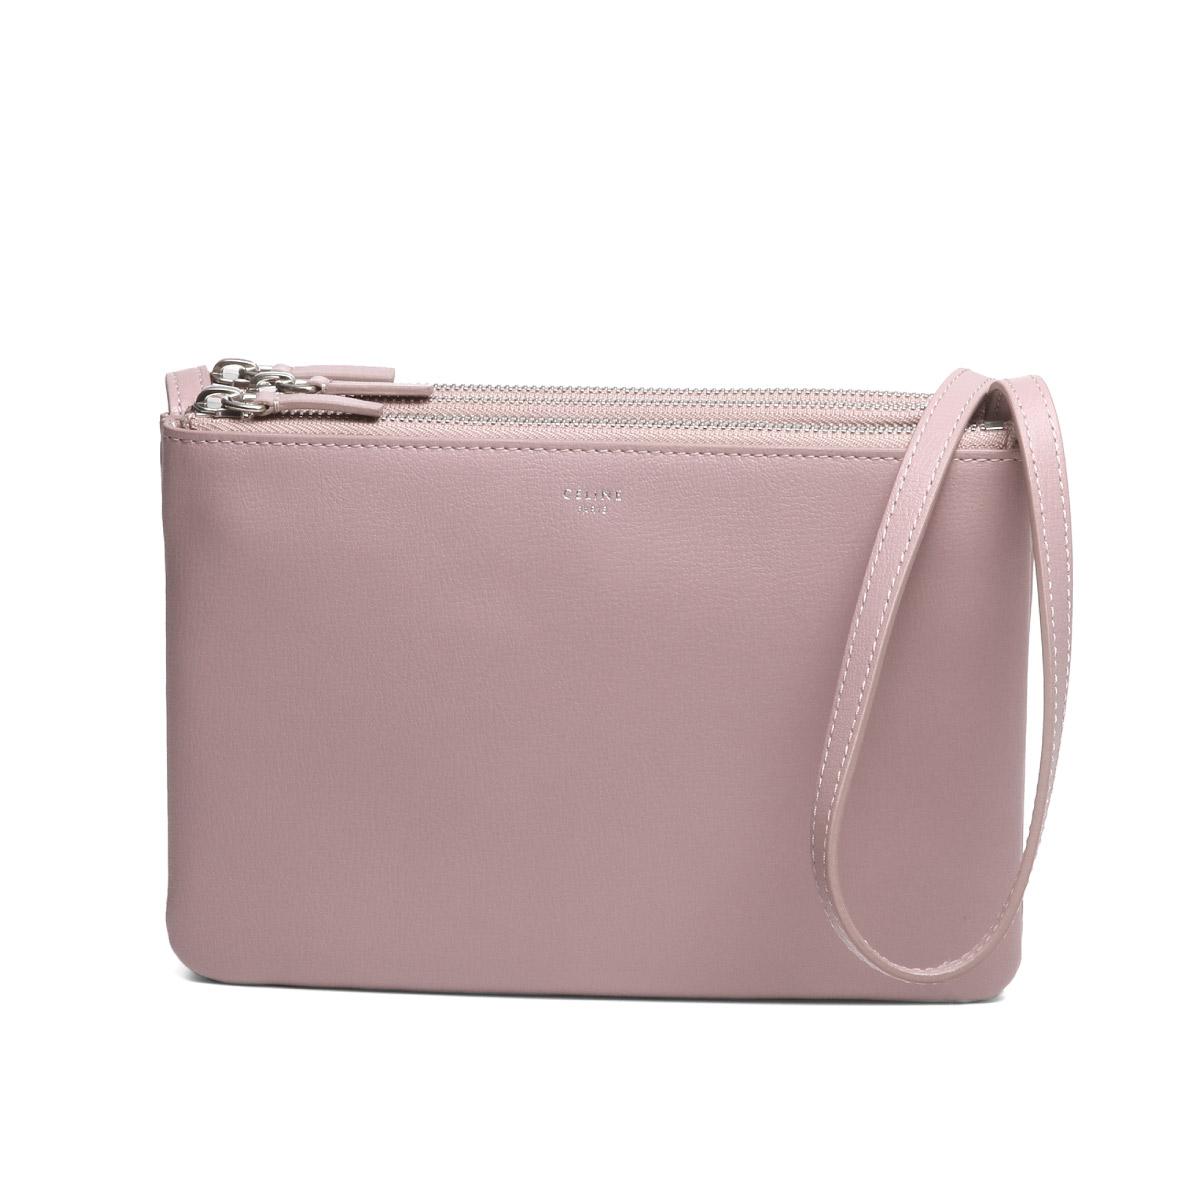 bbfa3fafc4 importshopdouble  Celine CELINE bag lady 165113B2Y 24RS shoulder bag TRIO  trio ANTIQUE ROSE pink